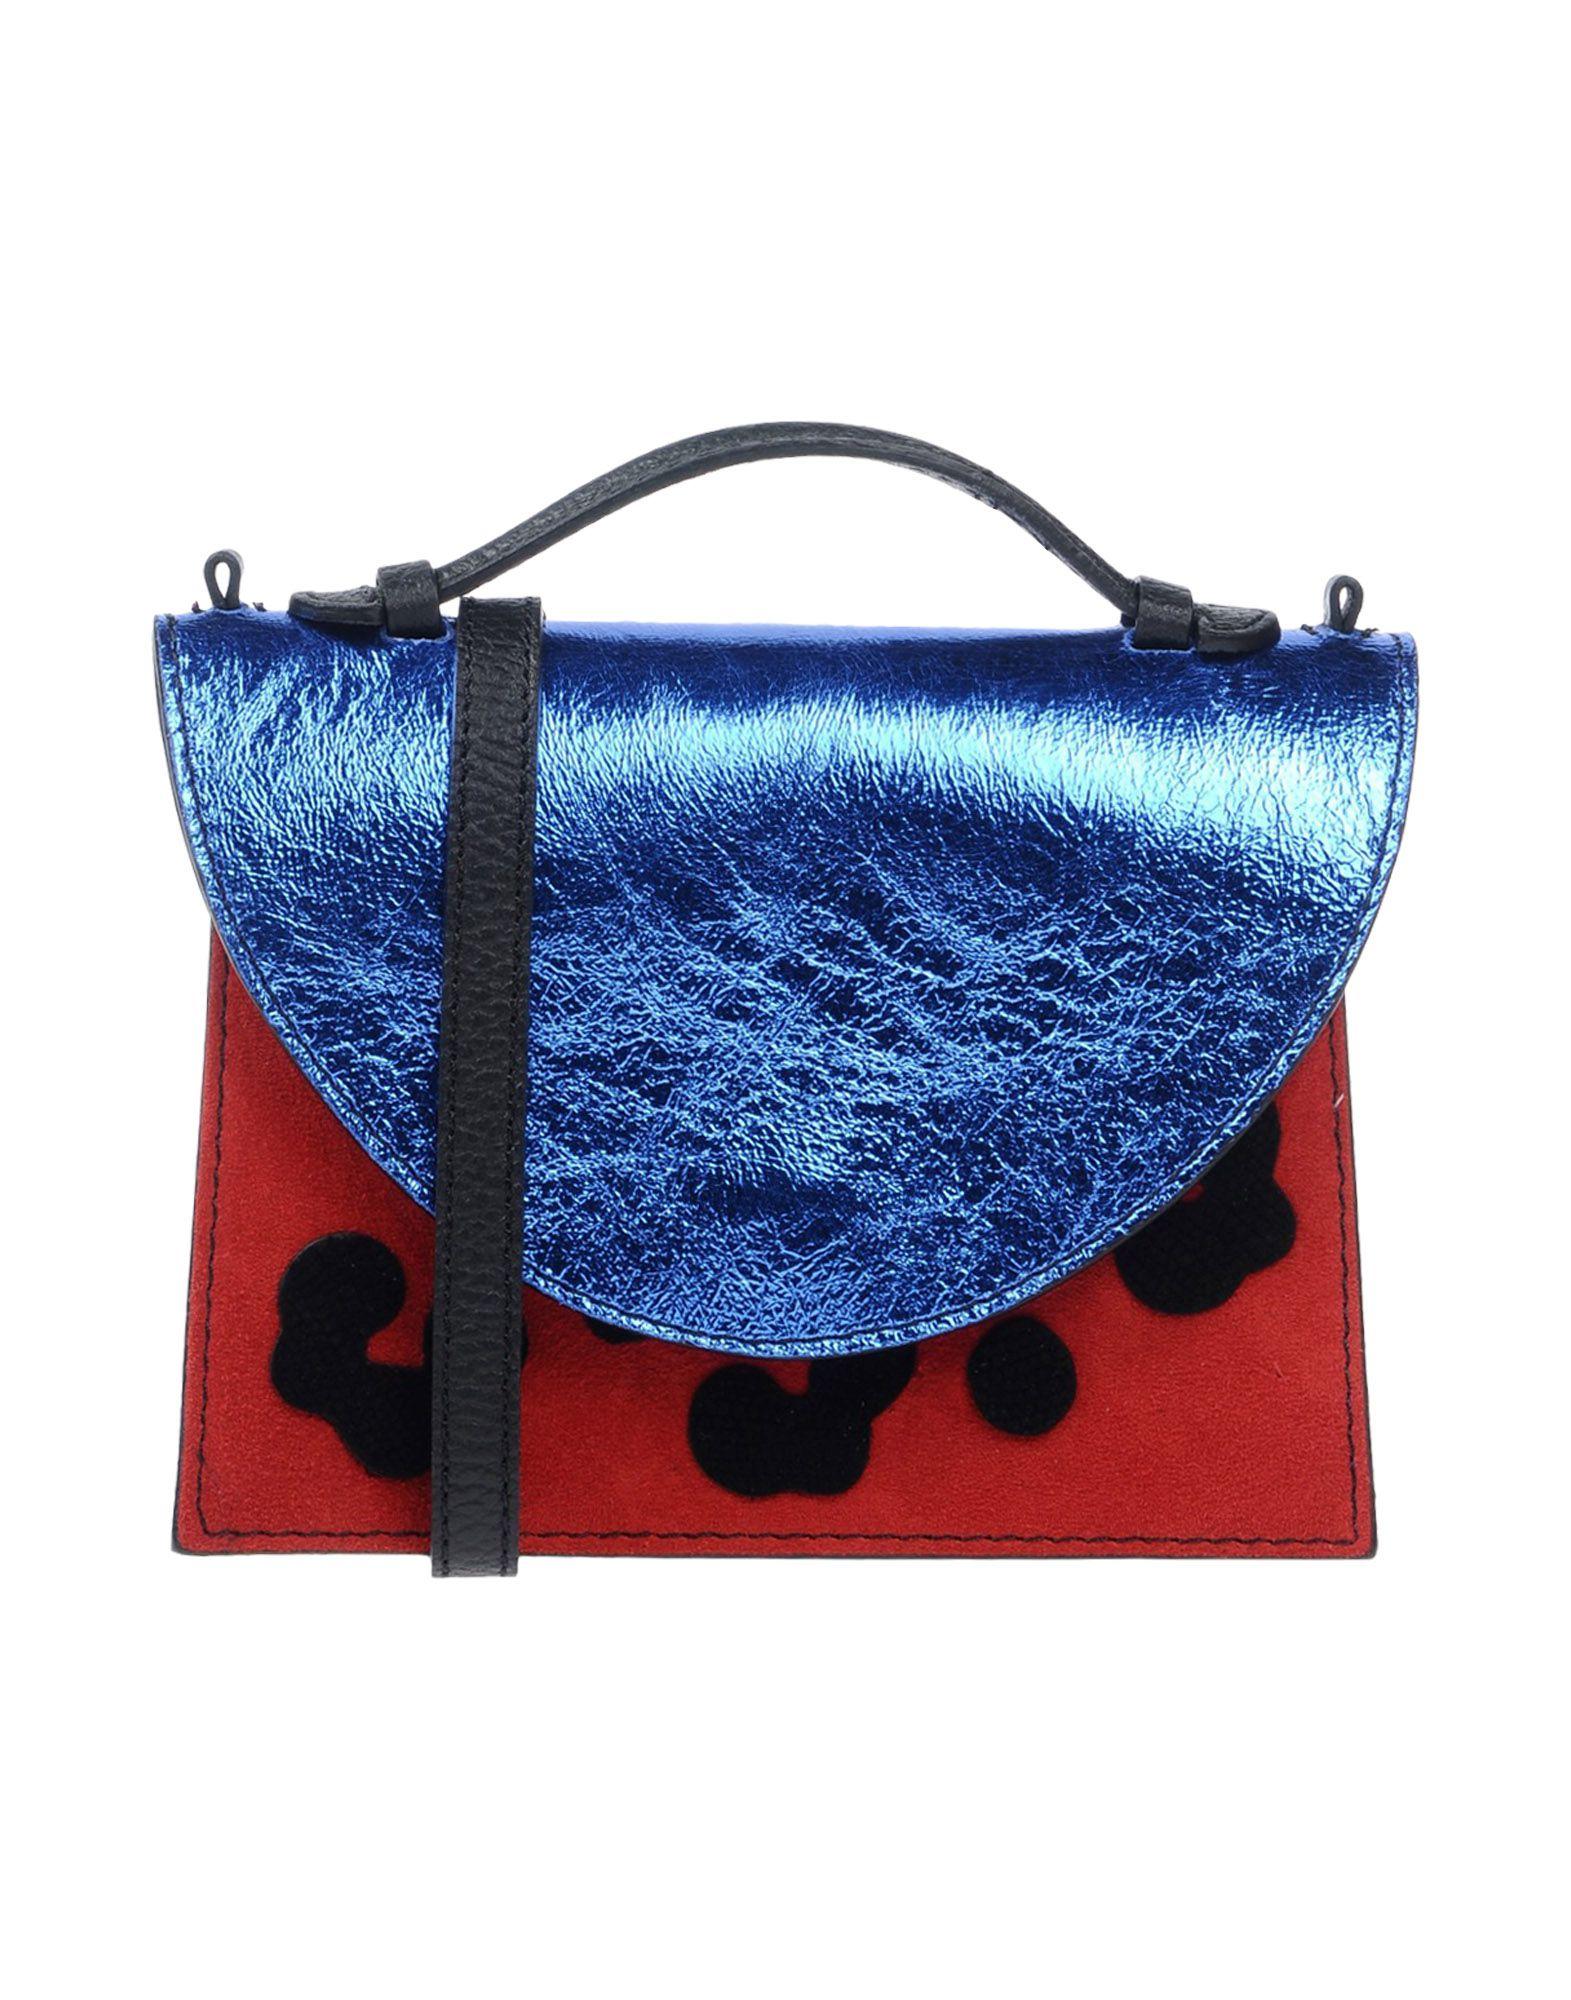 IMEMOI Handbag in Blue